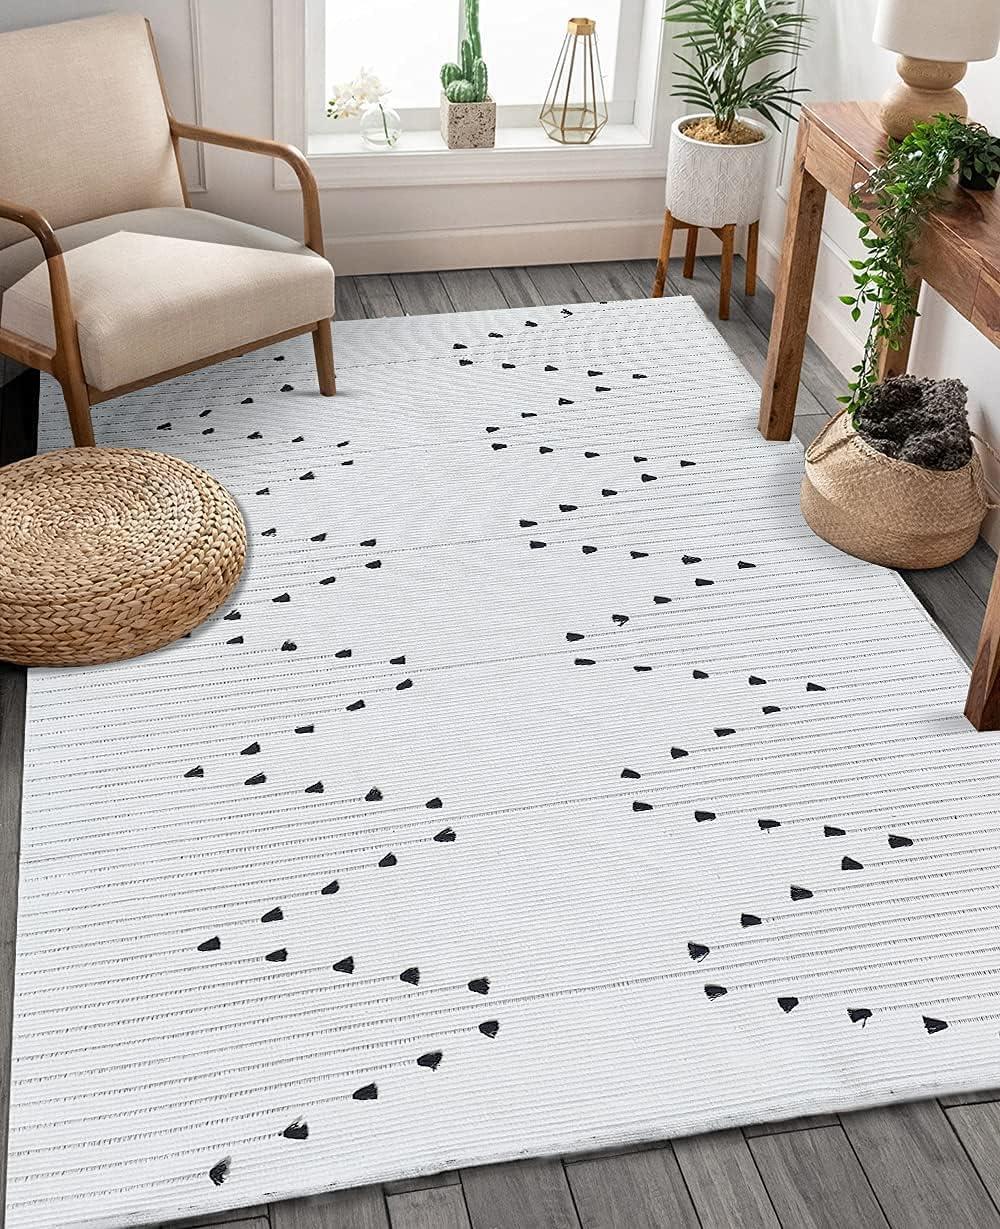 Boho Cotton Area Rug 4'x6' Woven Moroccan Geometric White Rugs Chic Bohemian Indoor Outdoor Rug Farmhouse Throw Rug Washable Floor Carpet for Entry Mat Living Room Bedroom Patio Bathroom Decor